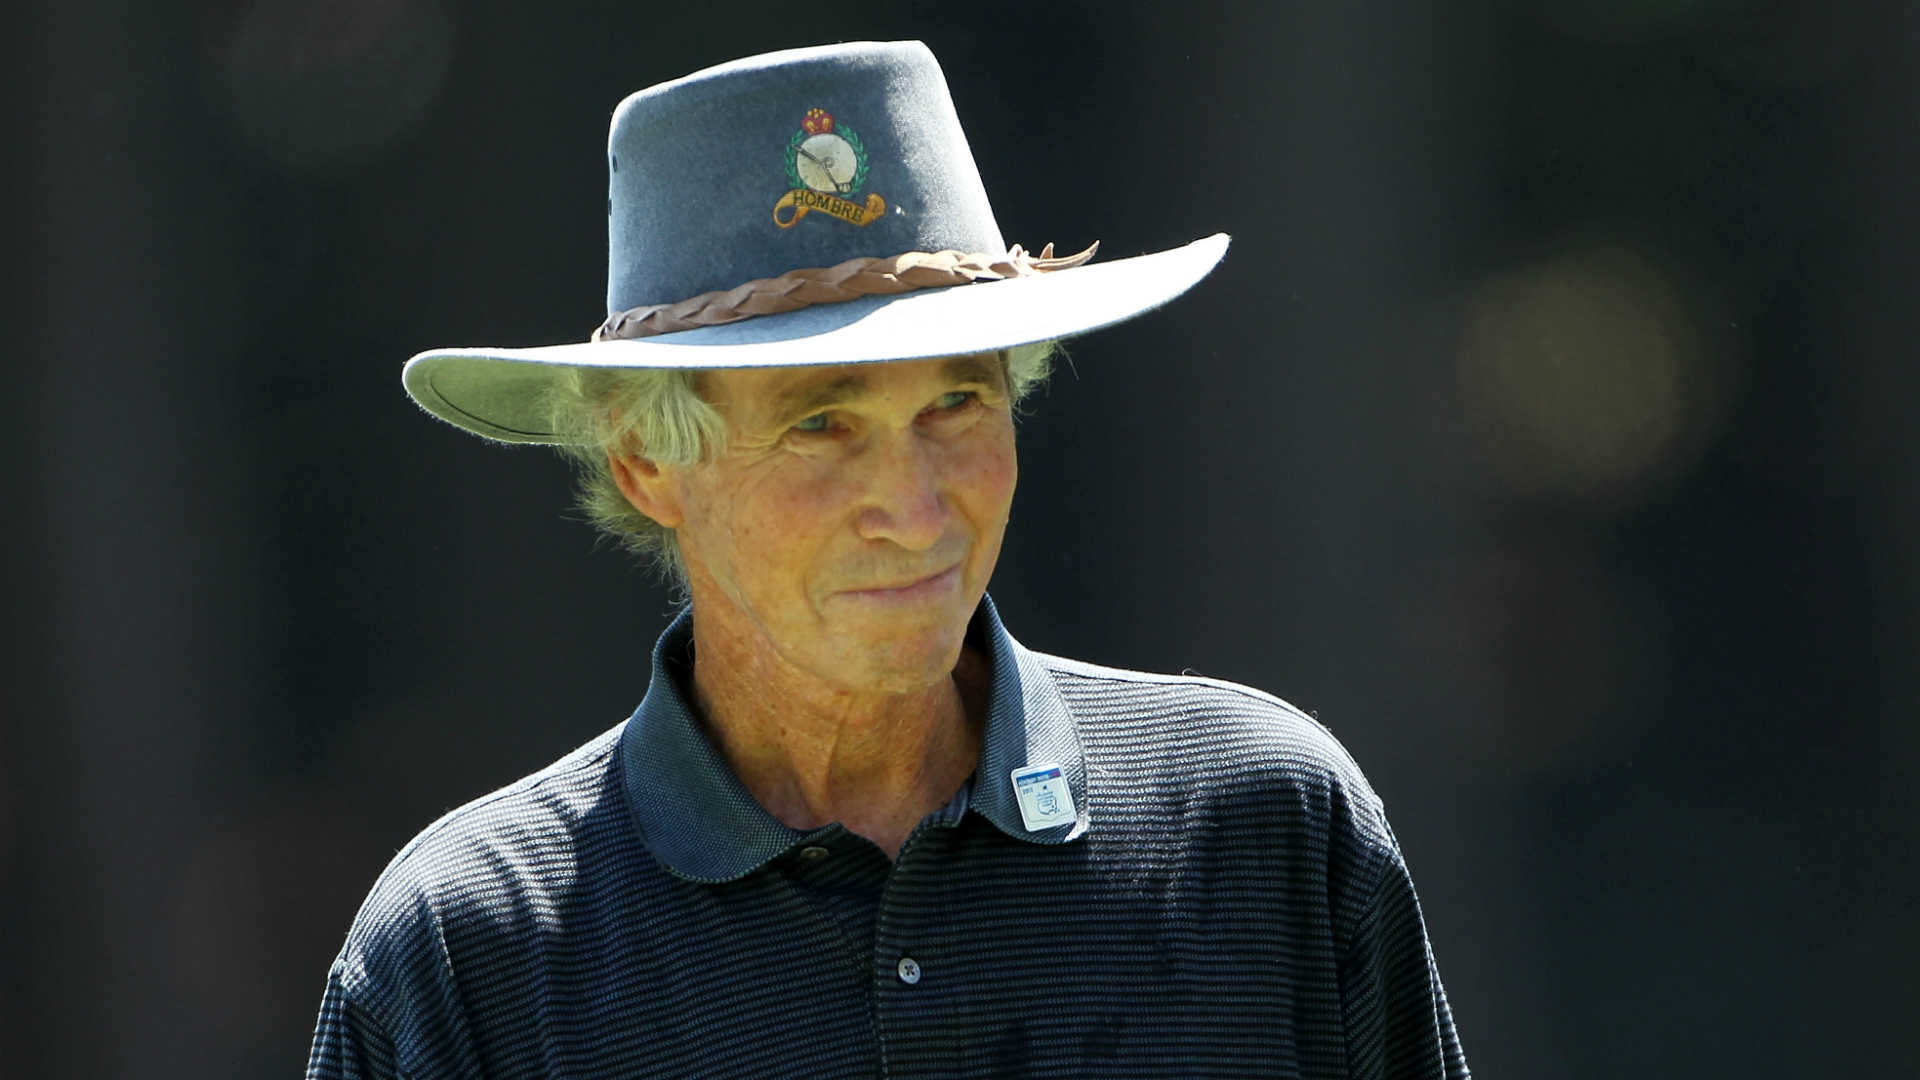 Hubert Green, U.S. Open winner who ignored death threat, dies at 71